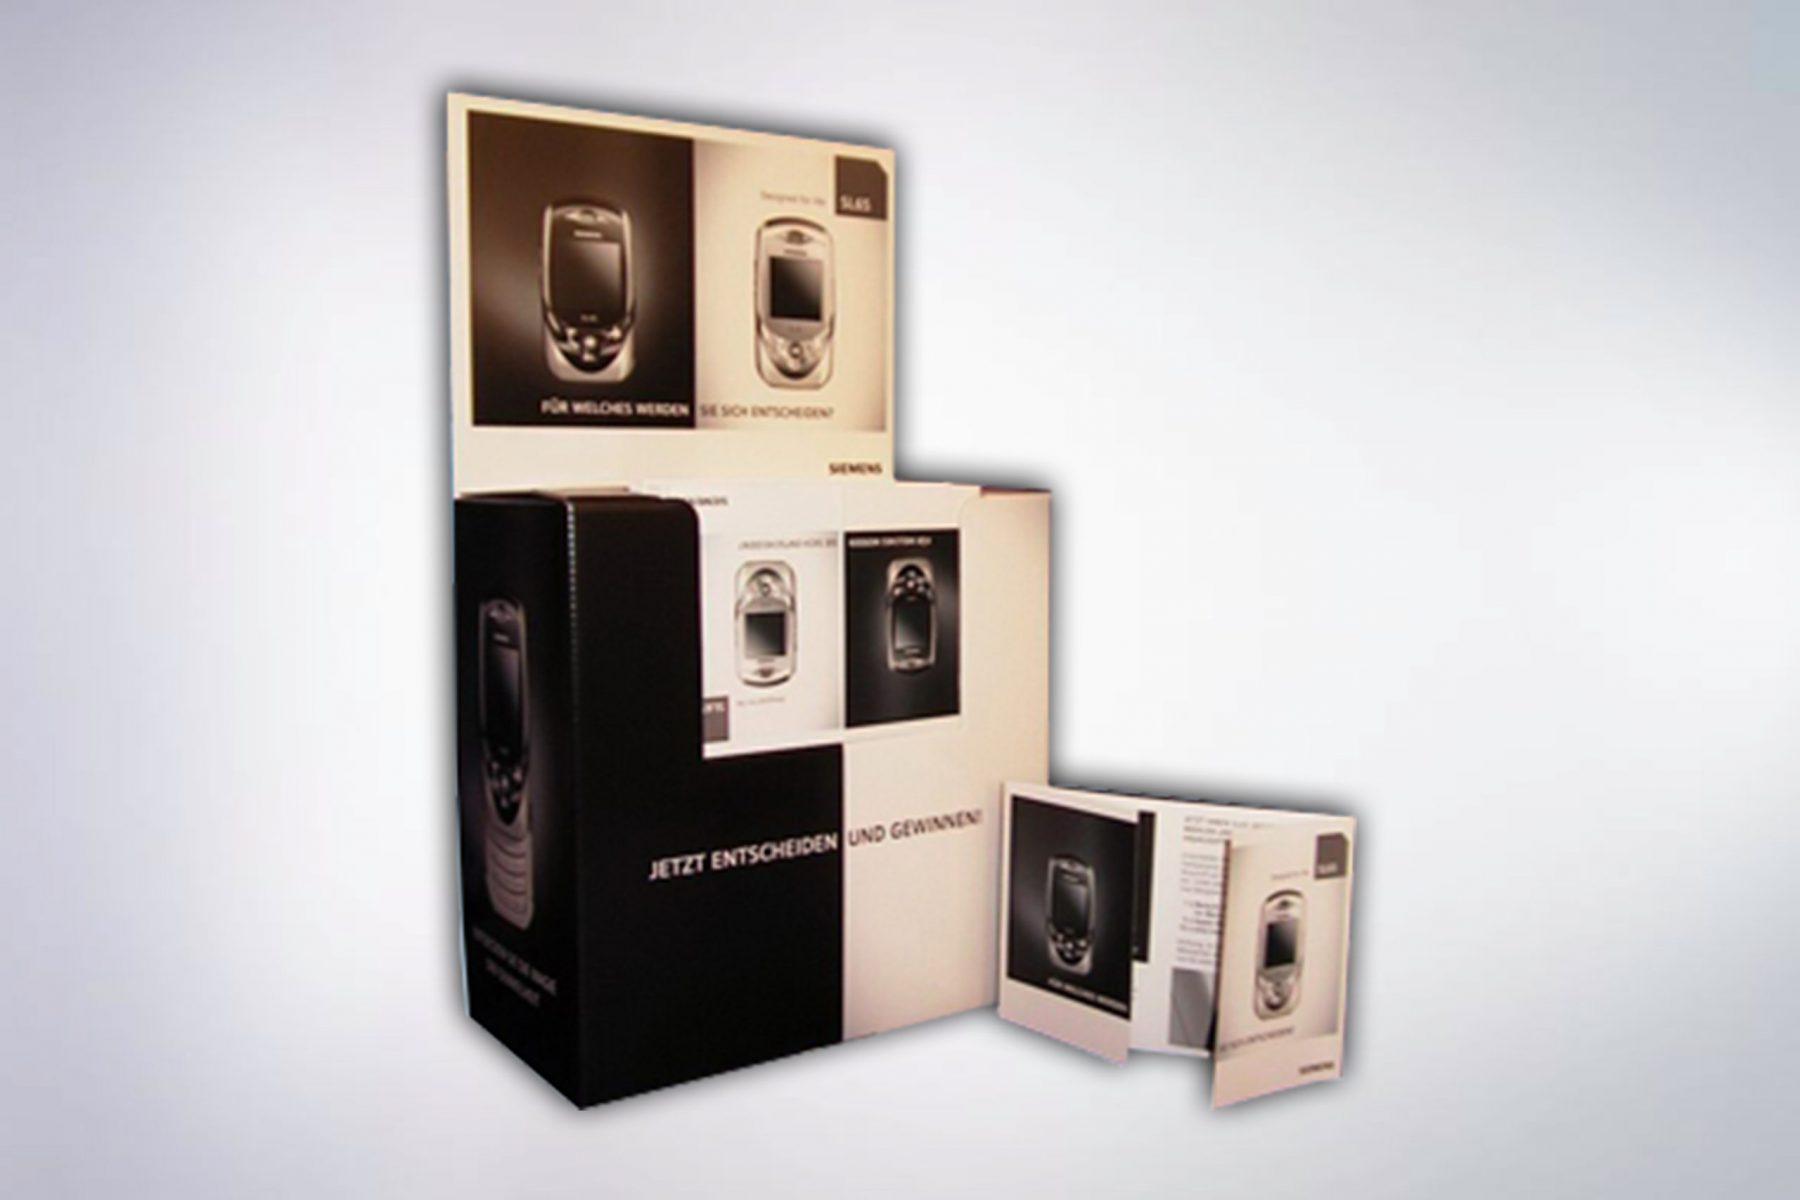 Siemens_Teilnahmekartenbox-scaled